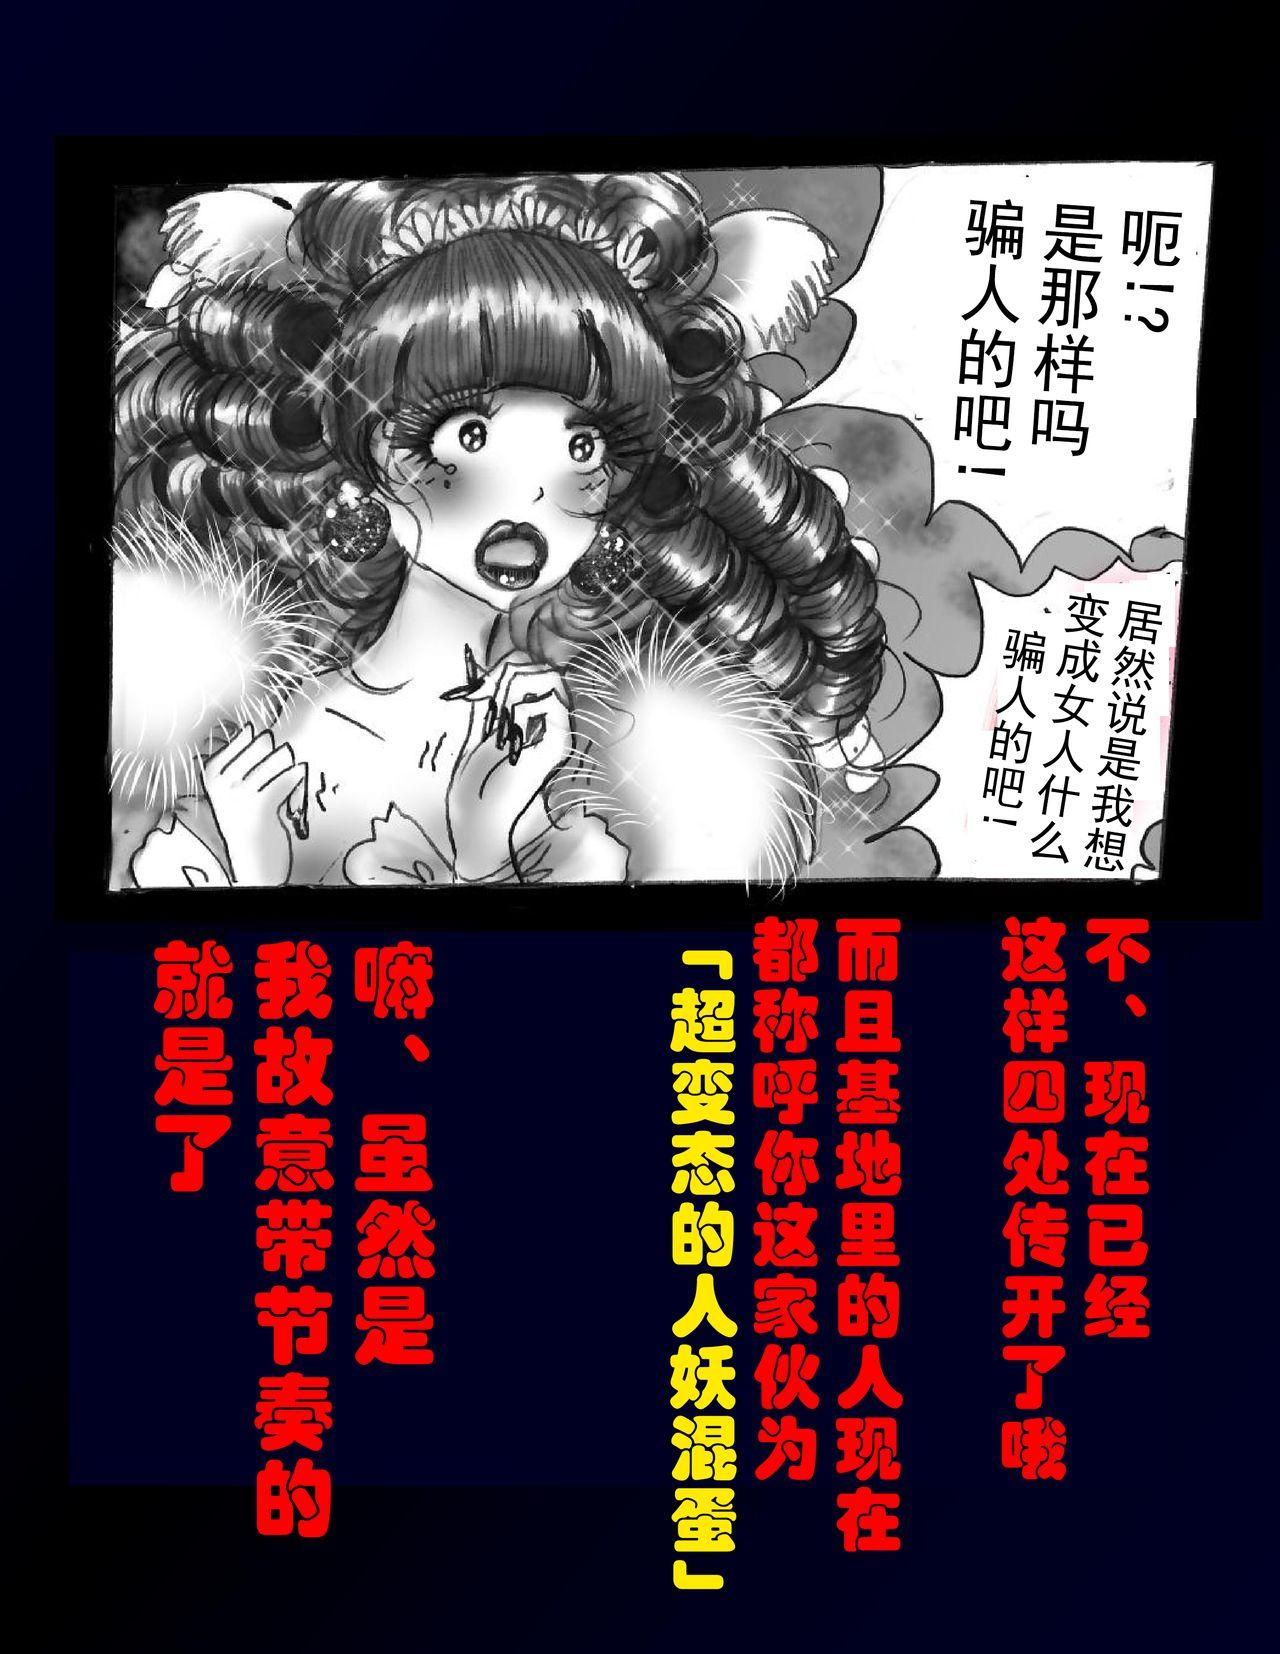 Kyousei Nyotaika Dress 74